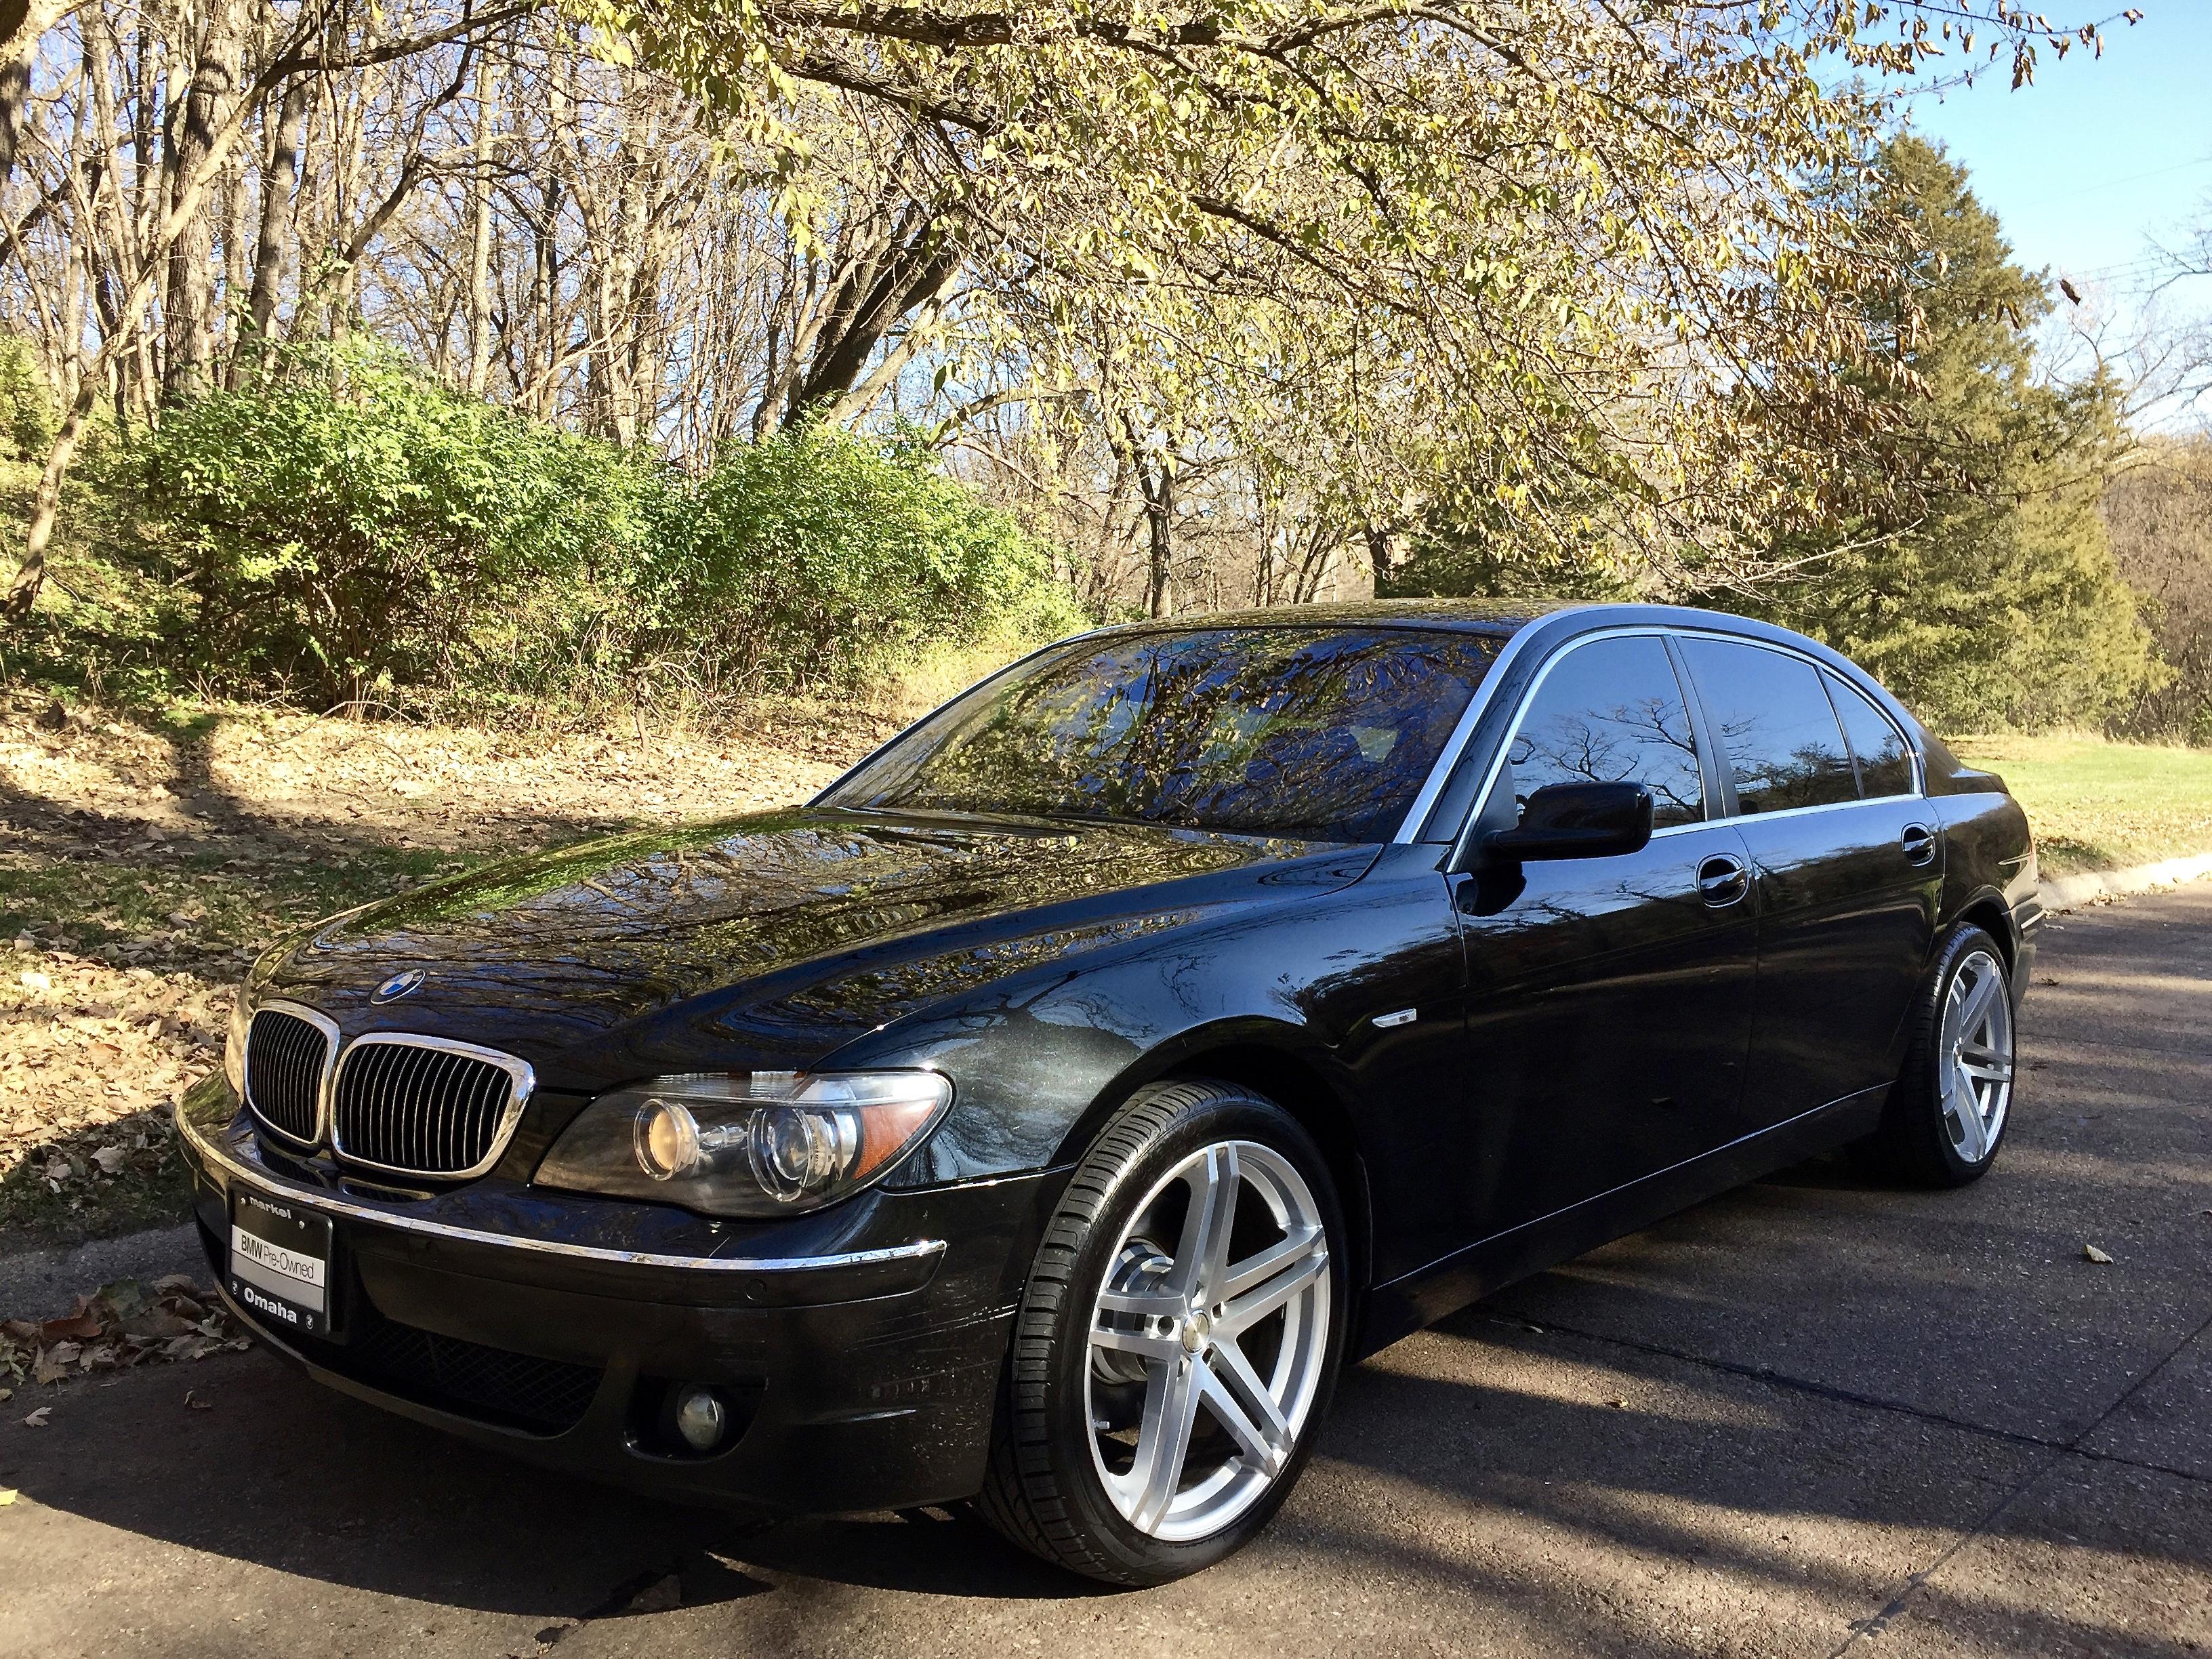 2006 BMW 750Li (SOLD) - S Line Motorsports LLC